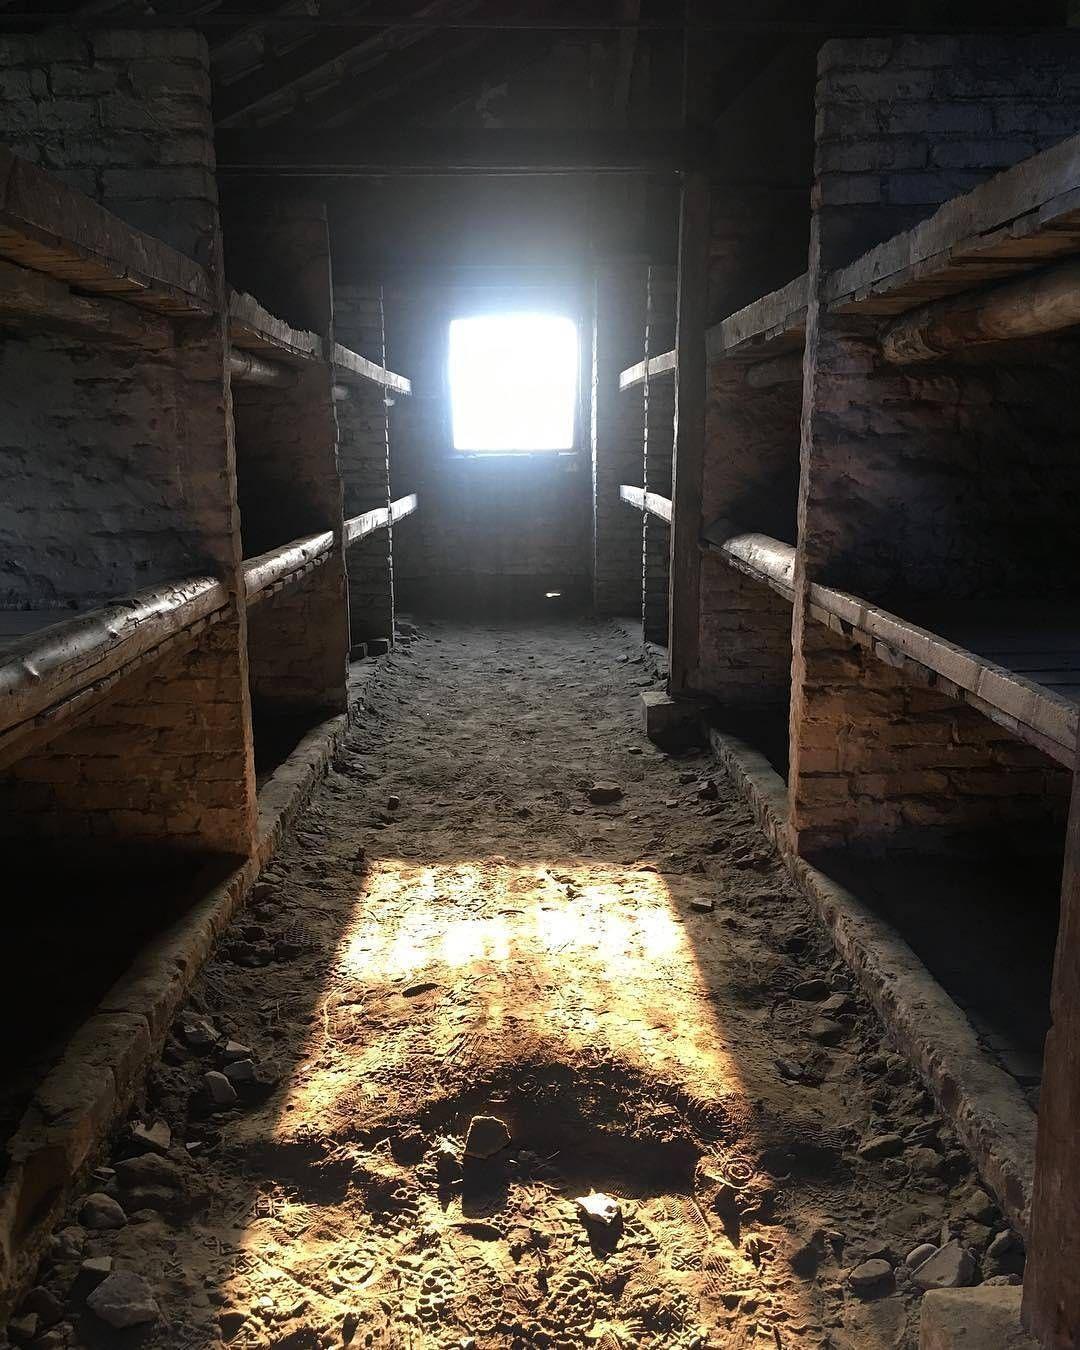 By Chambers: Auschwitz II-Birkenau. BIa Sector. Block 25. Isolation